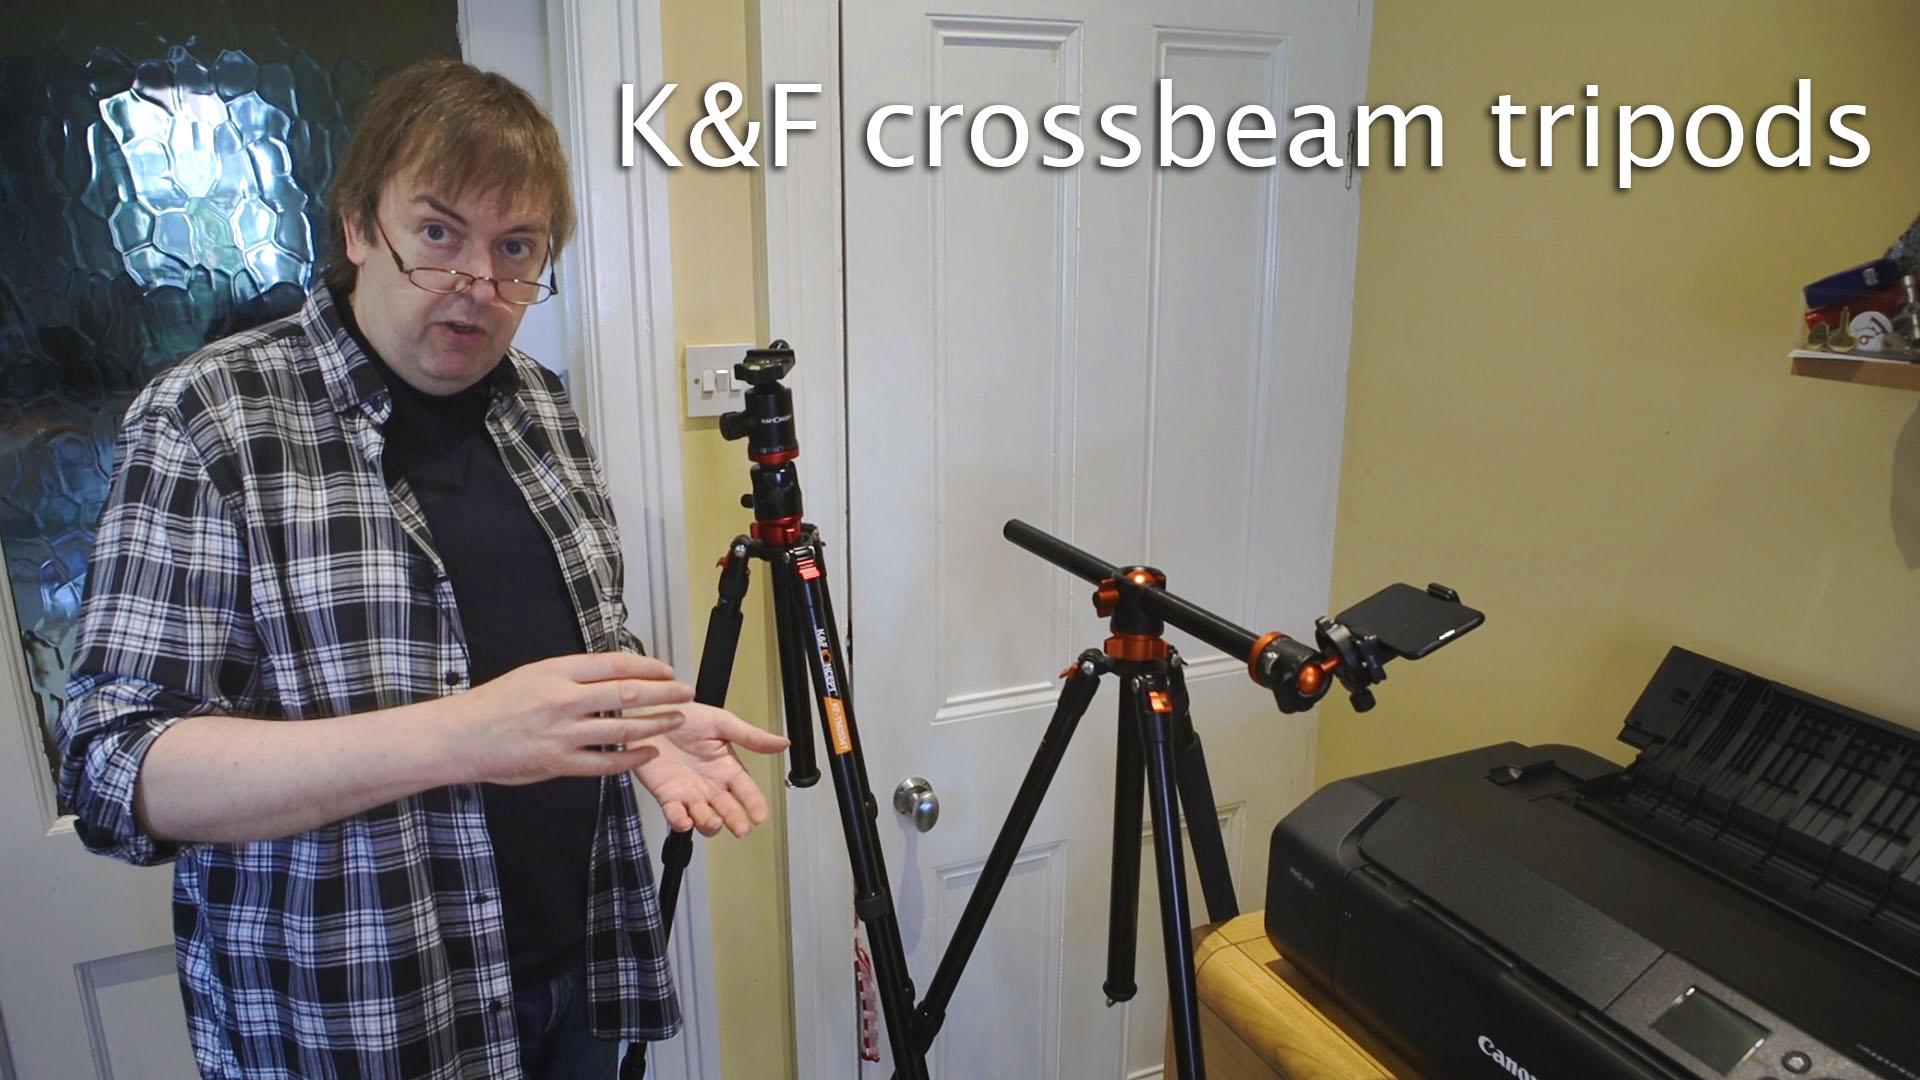 KF crossbeam tripods